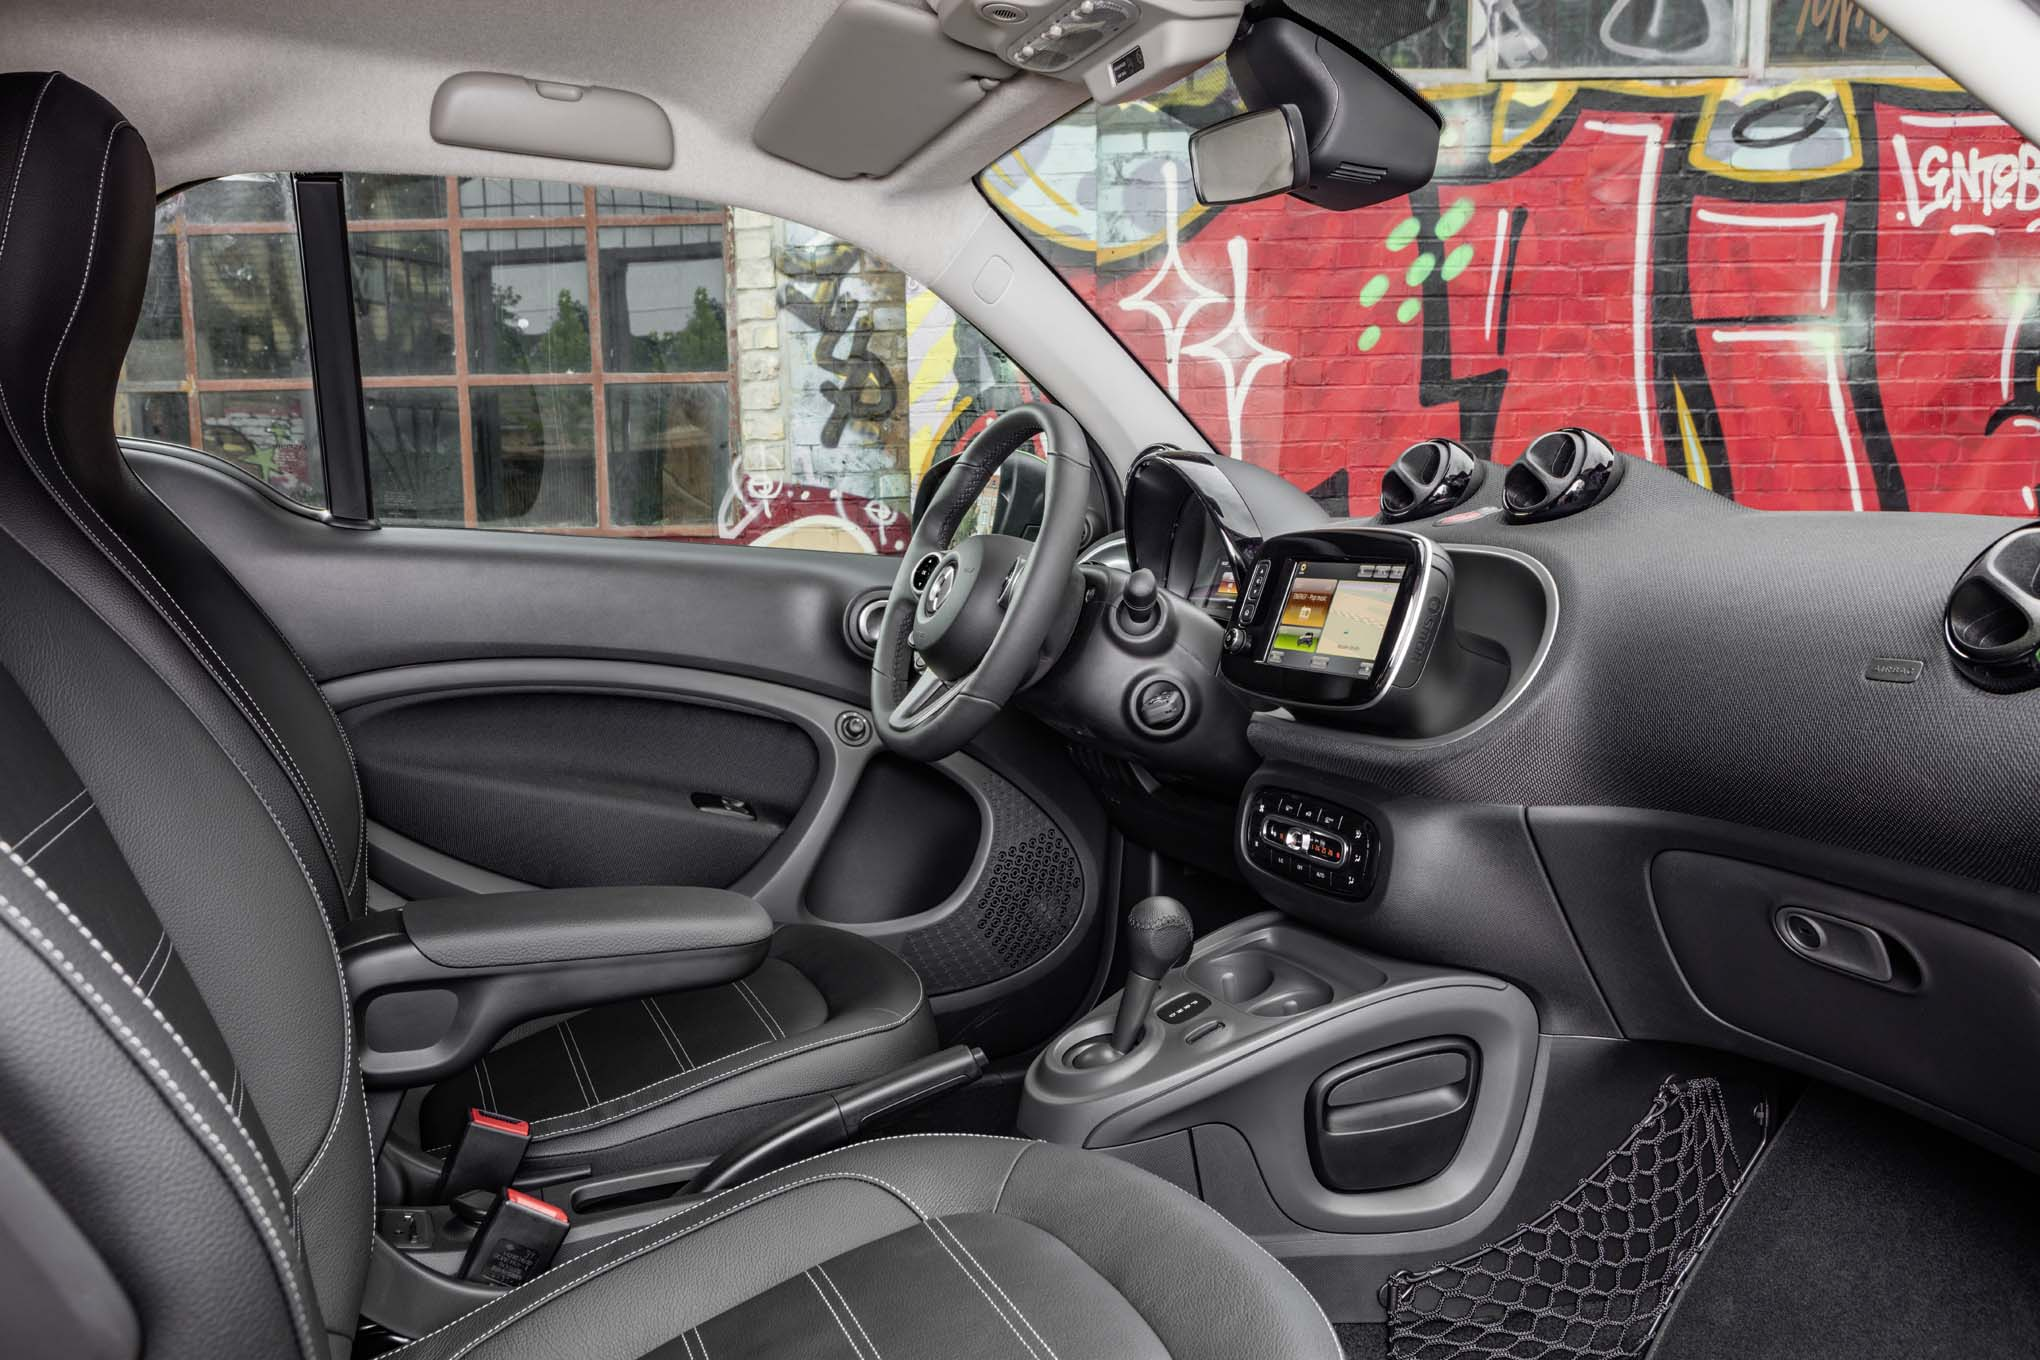 2017 smart fortwo electric drive unveiled before paris show automobile magazine. Black Bedroom Furniture Sets. Home Design Ideas